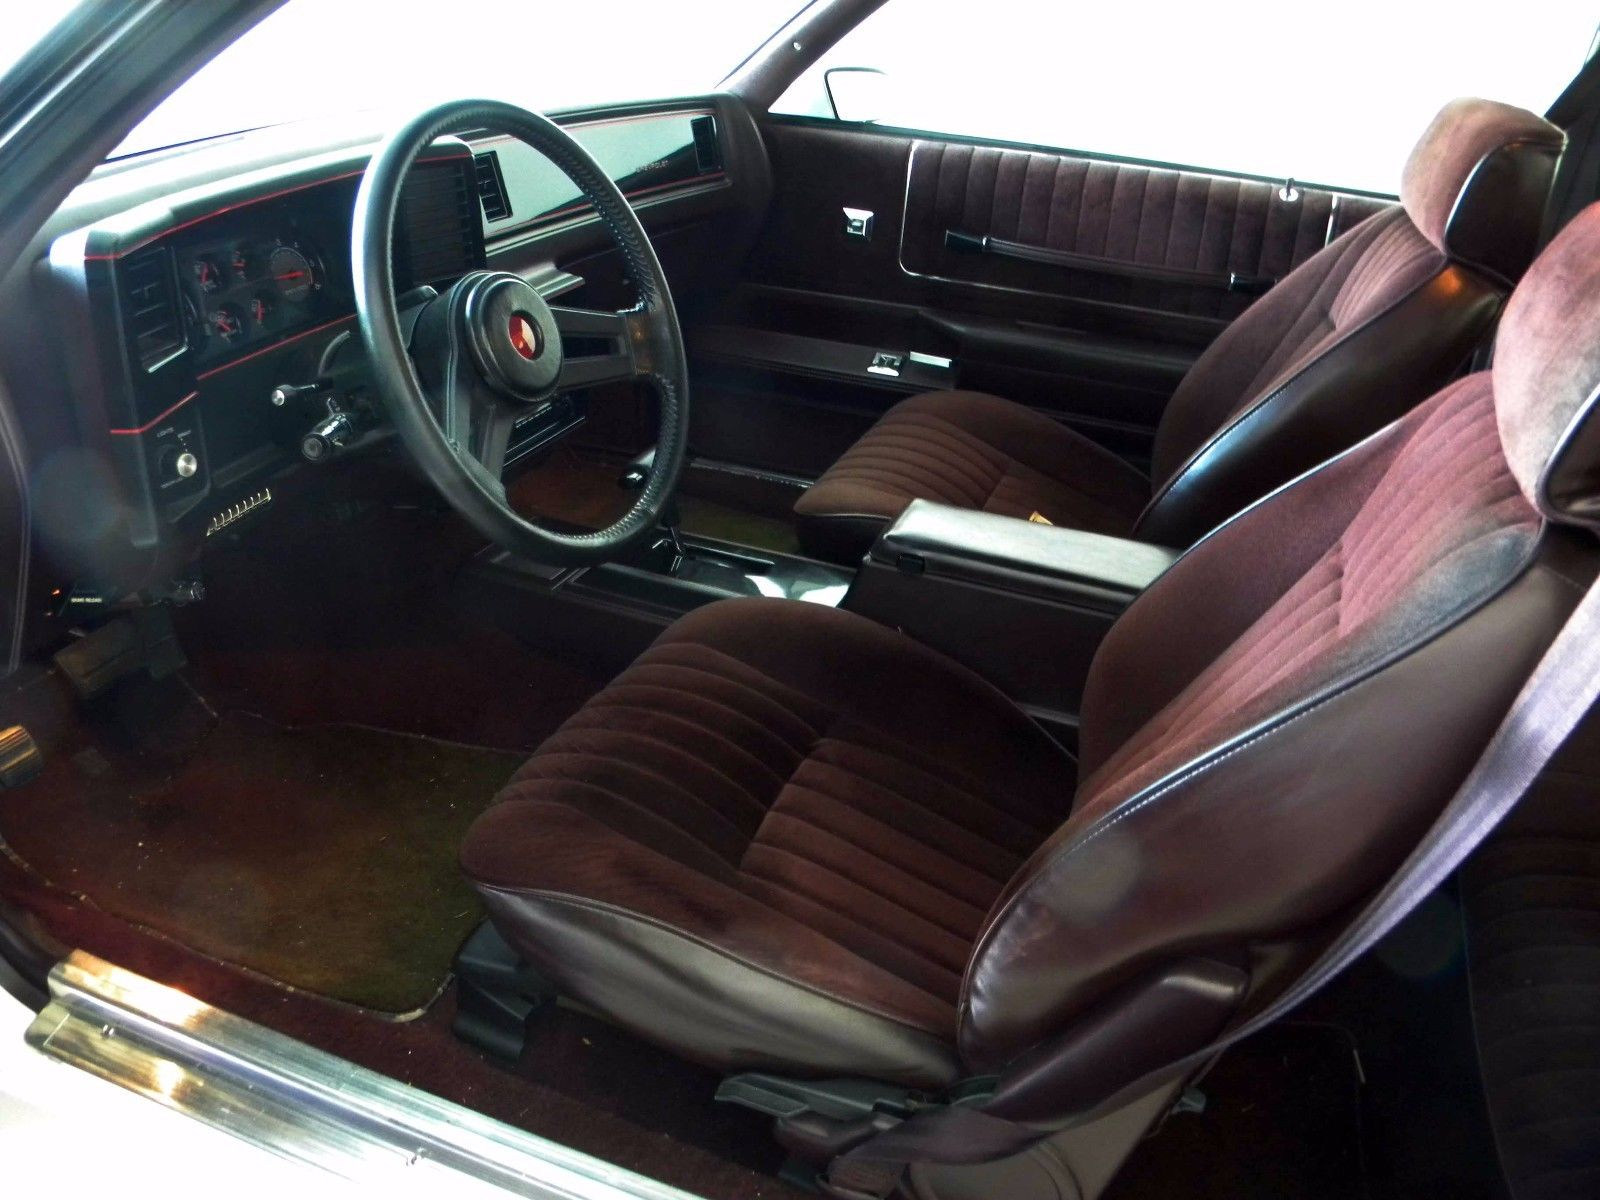 1987 Chevrolet Monte Carlo SS Interior